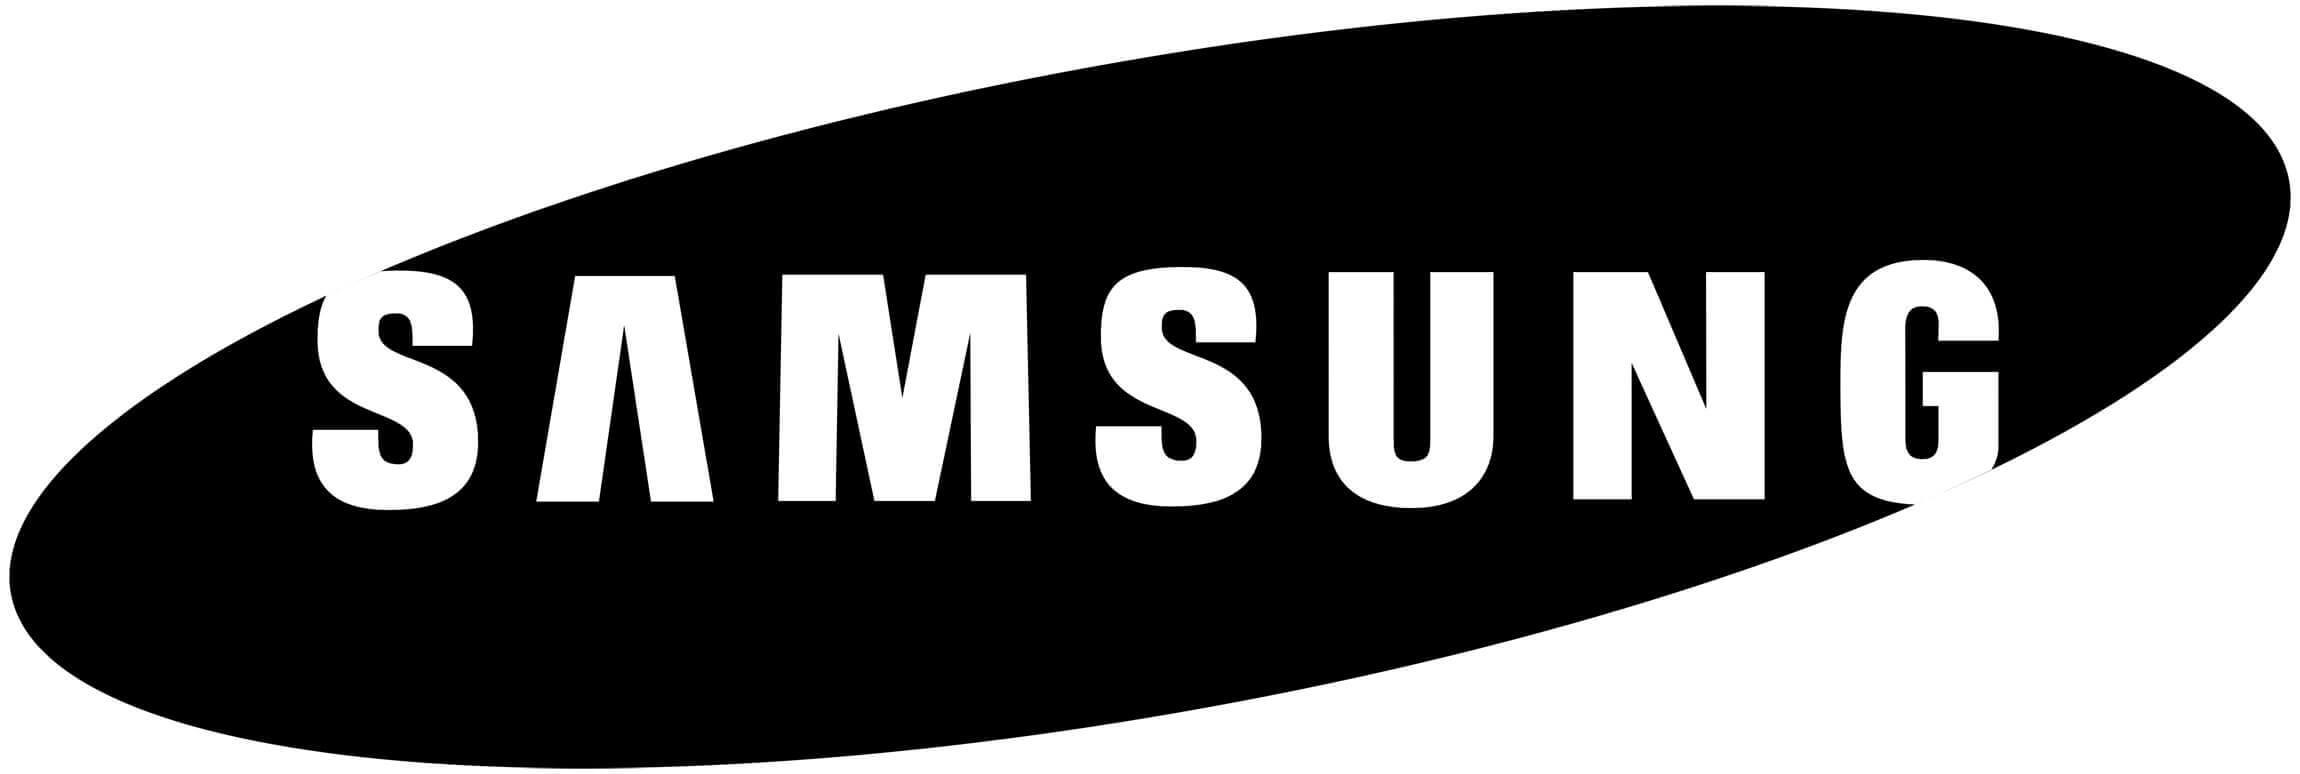 SAMSUNG M2 SSD 970 EVO 1TB اس اس دی سامسونگ